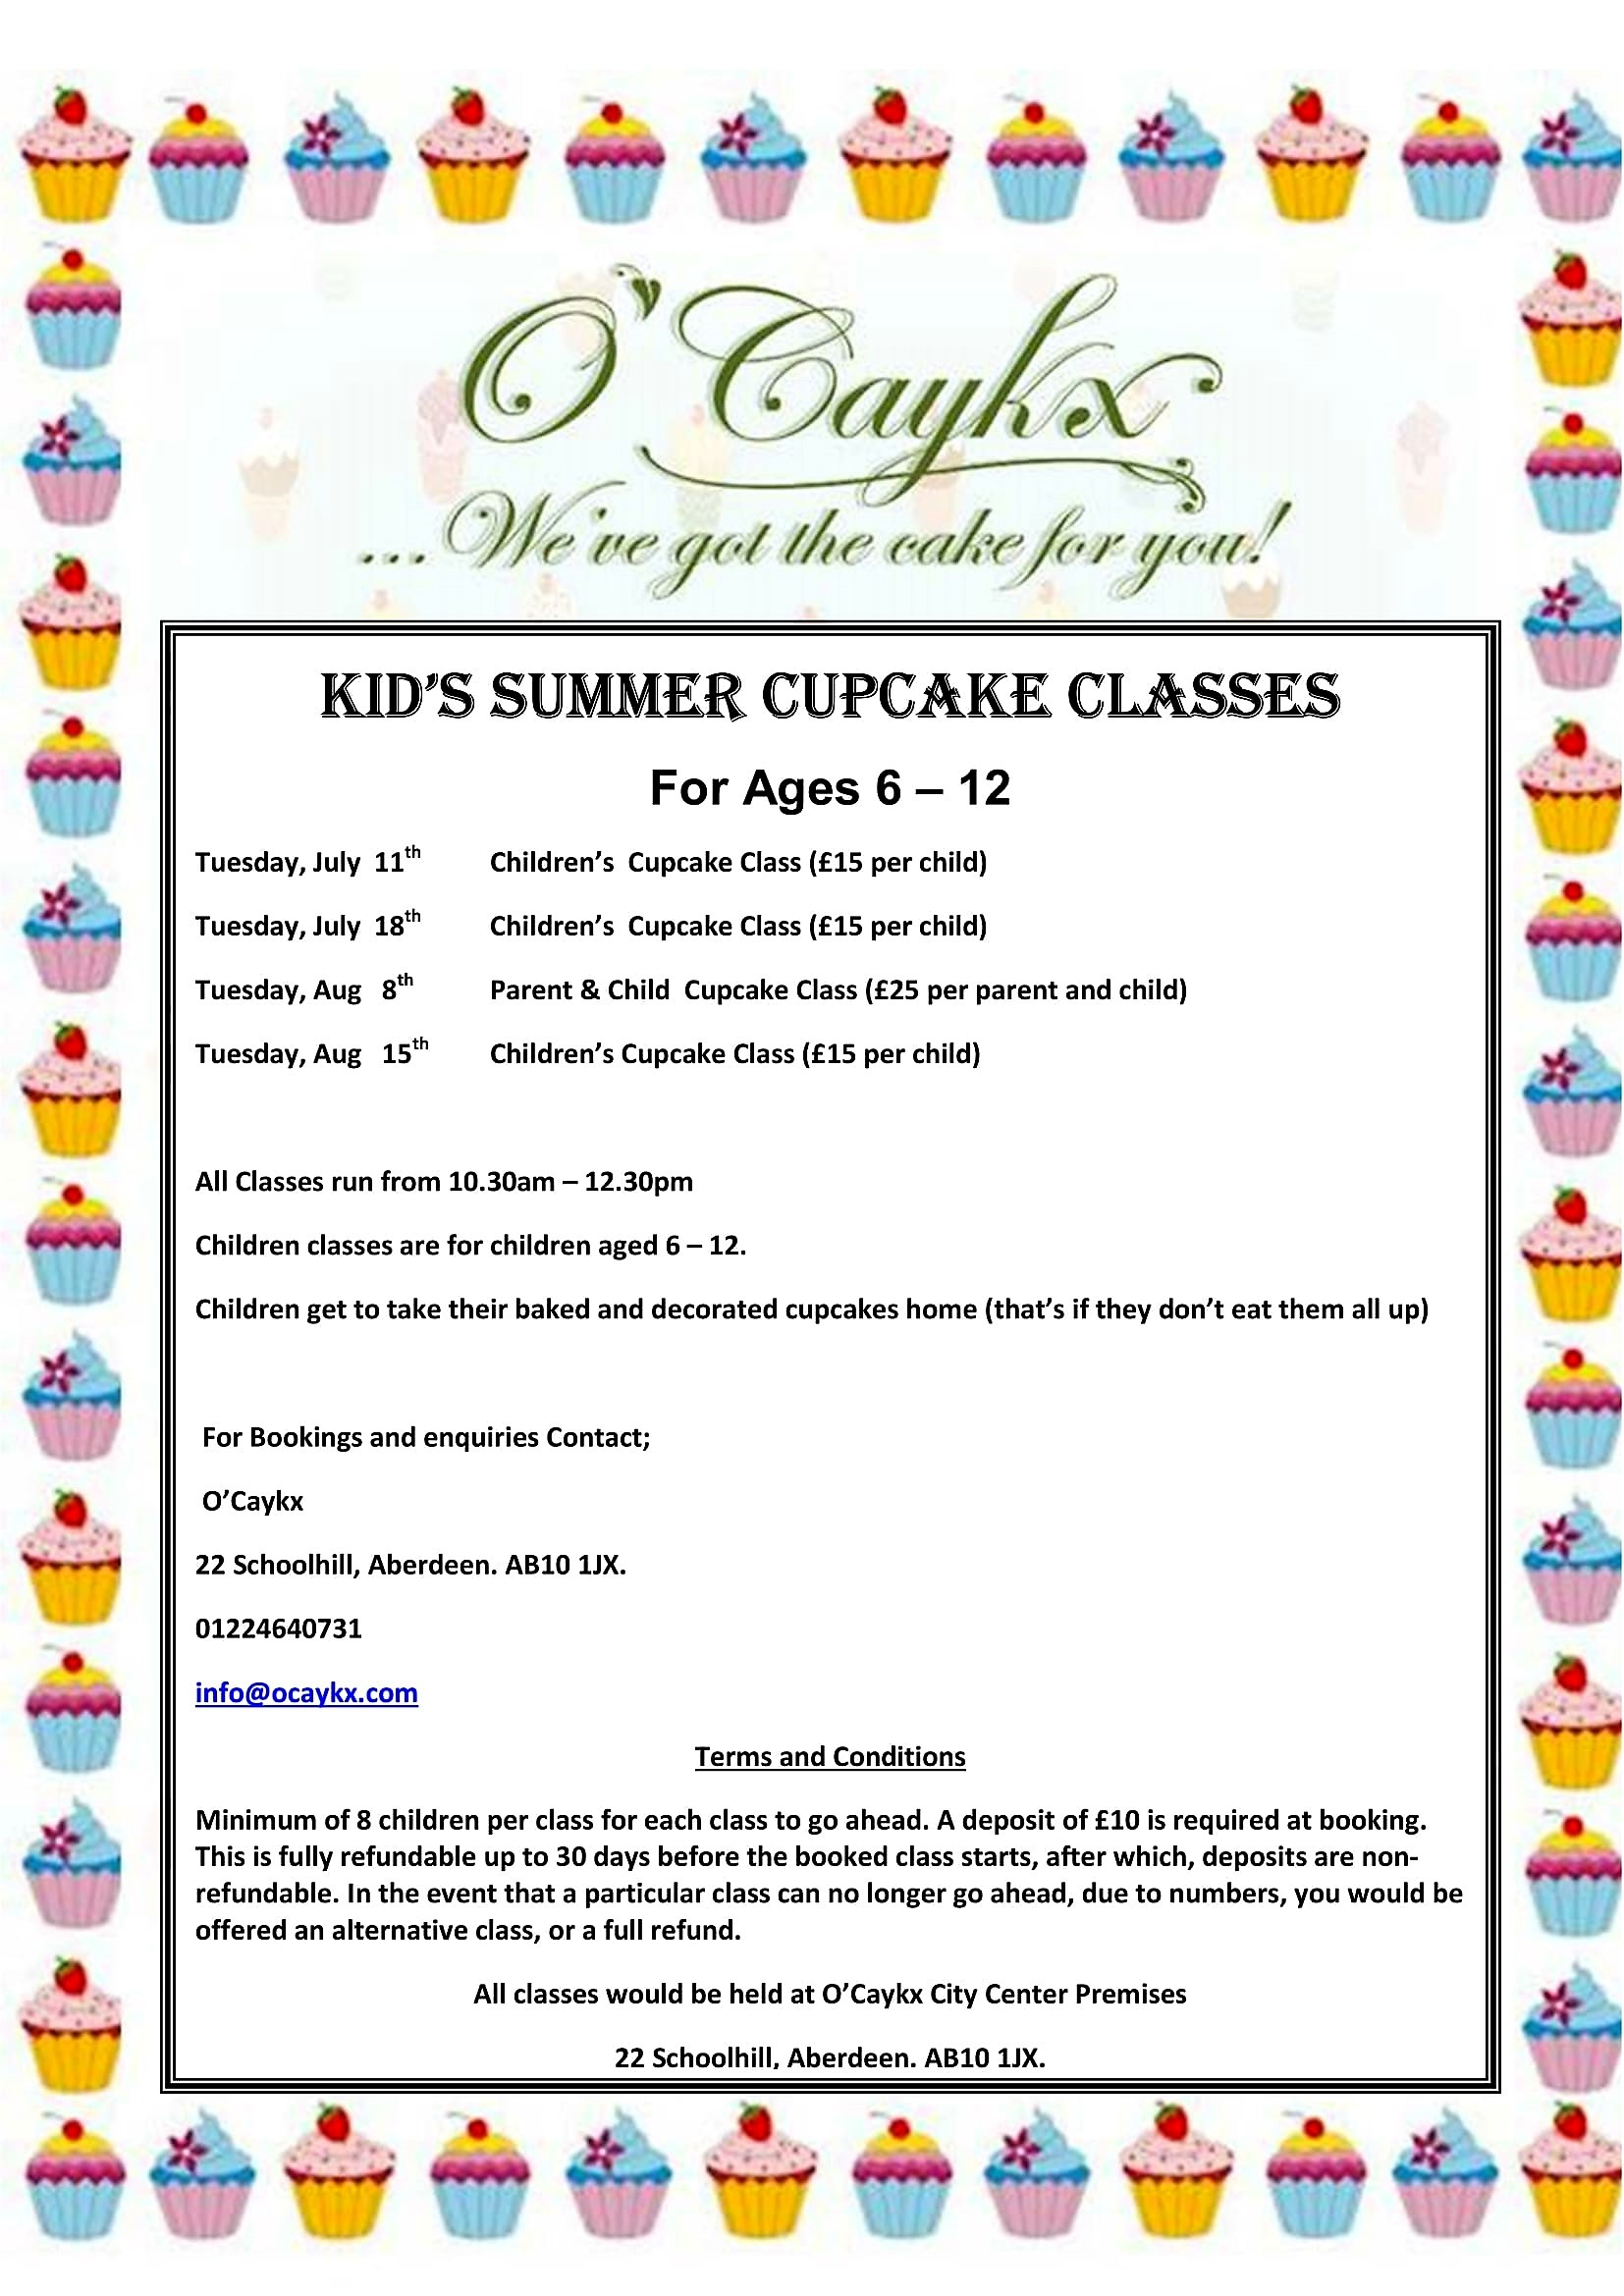 summer-cupcake-classes-2017-1.jpg